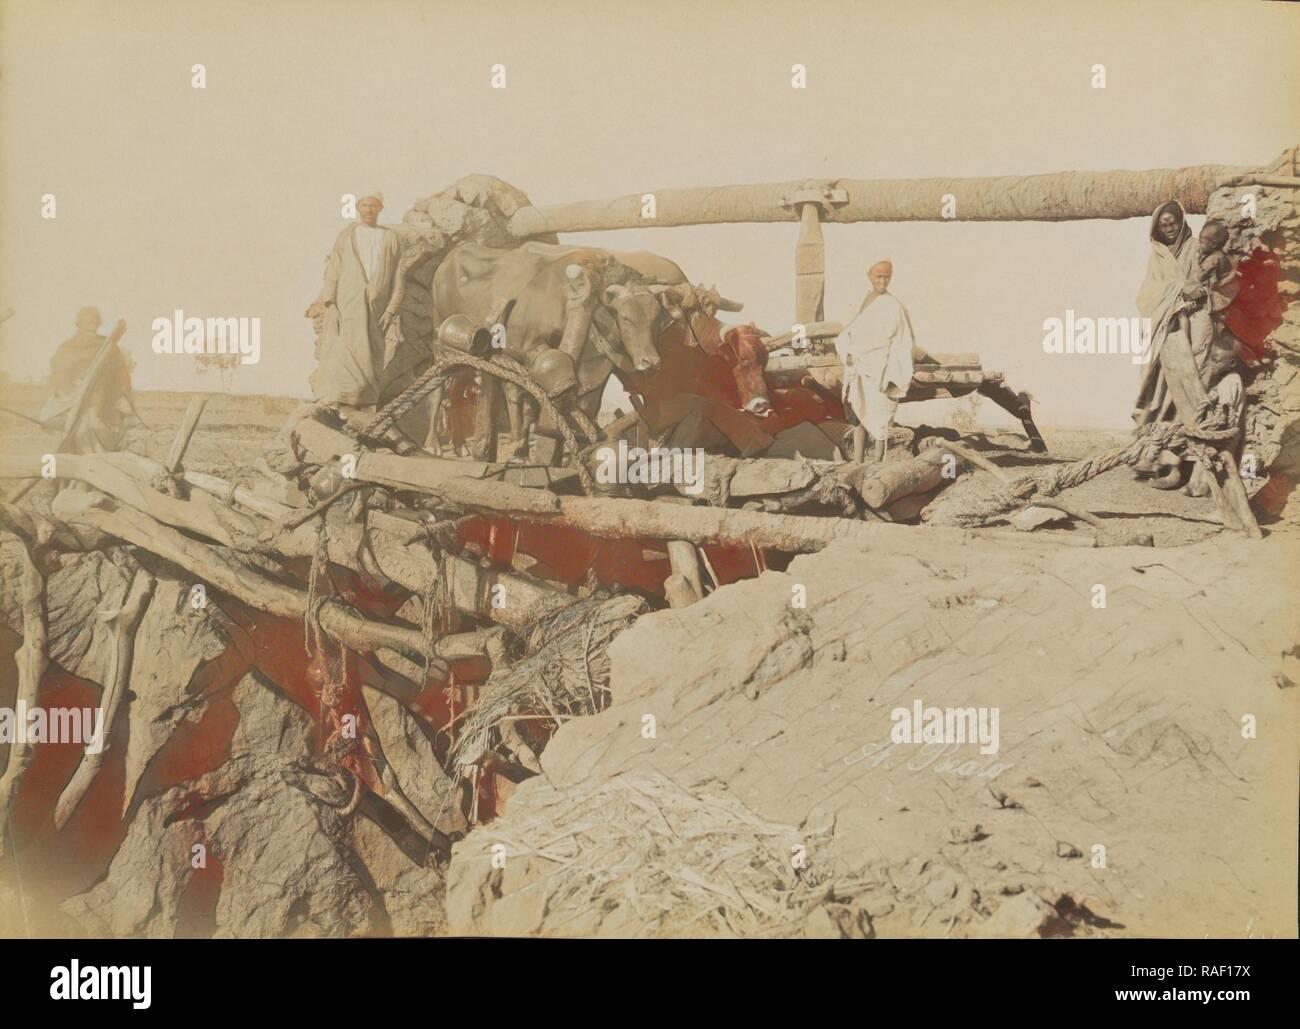 Sakkie, Antonio Beato (English, born Italy, about 1835 - 1906), 1880 - 1889, Albumen silver print. Reimagined - Stock Image